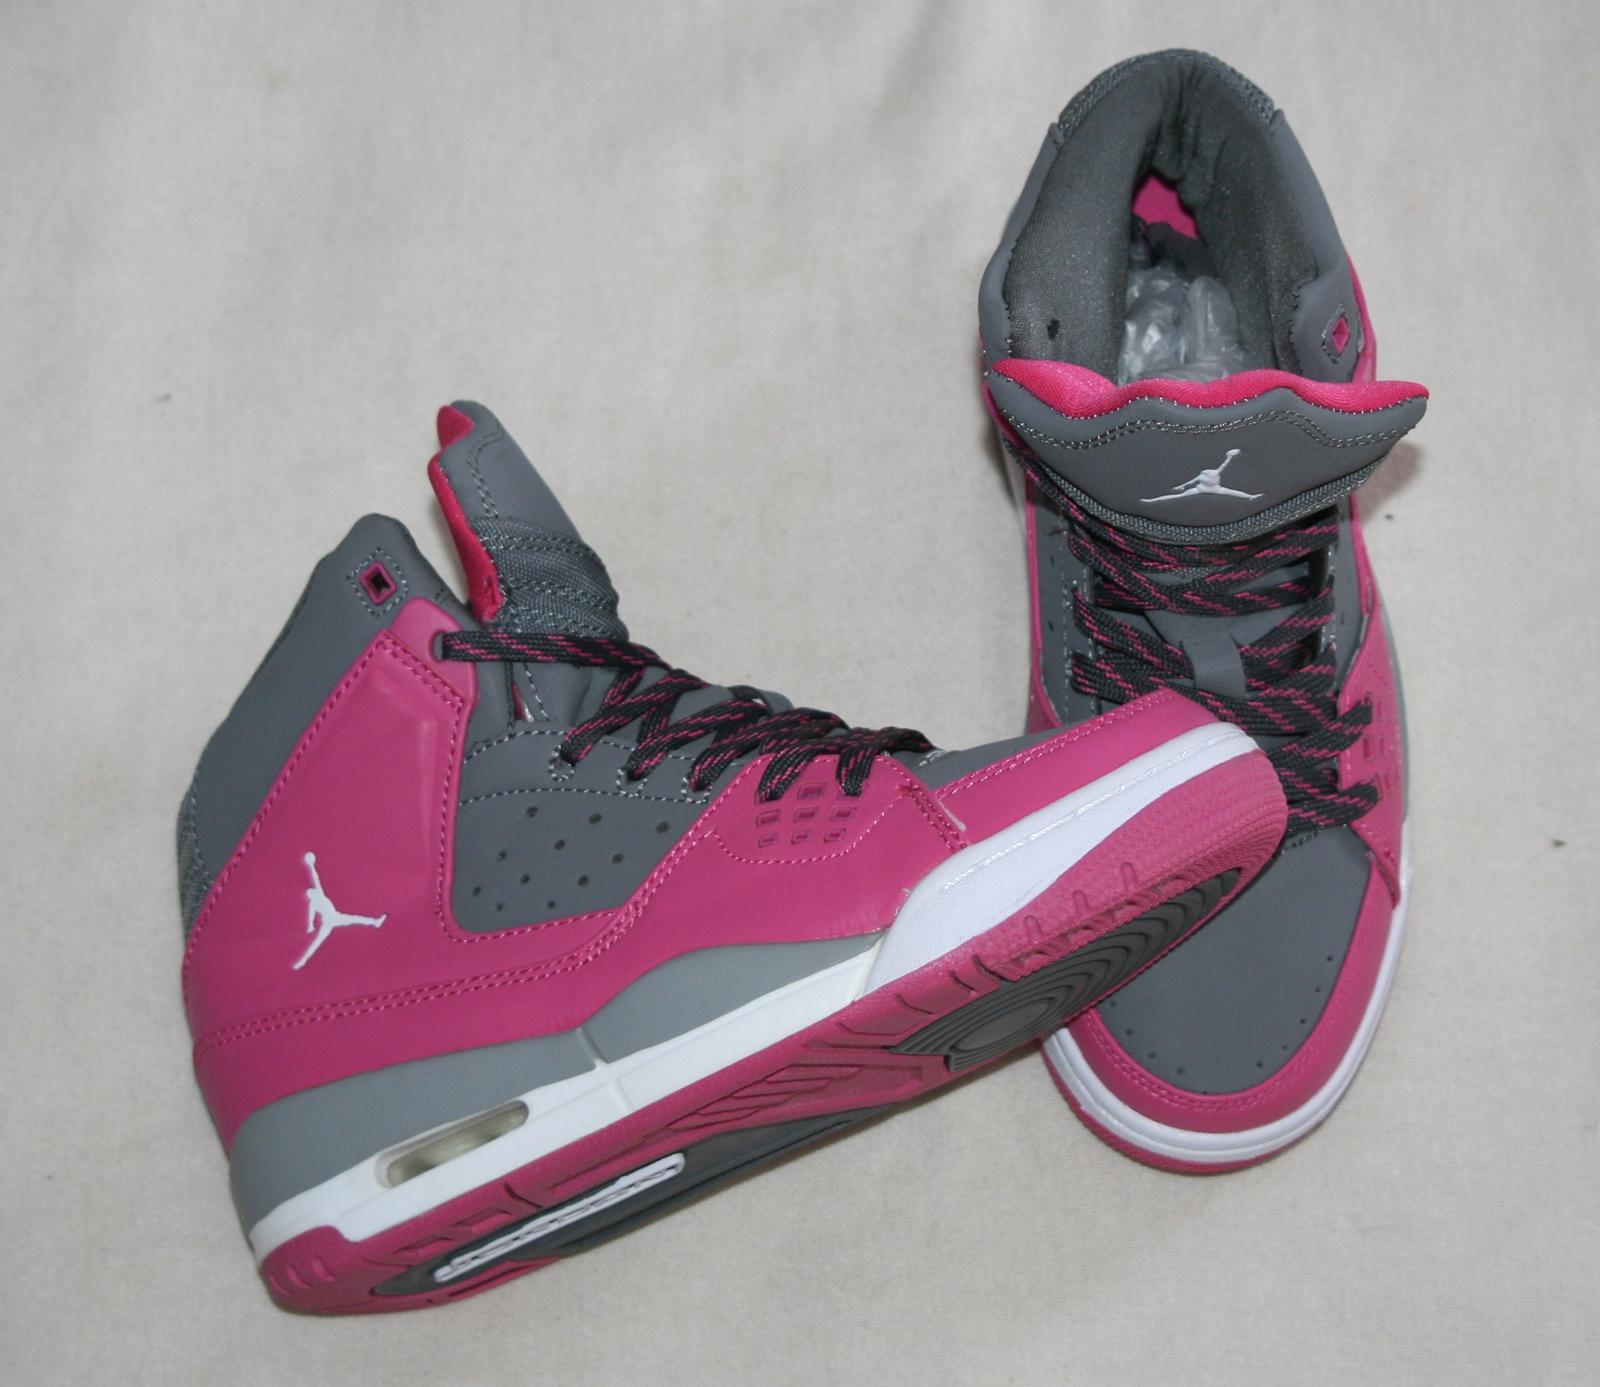 Chaussures Jordan Chaussures À Plateau Jordan À Plateau À Chaussures Jordan Plateau mOyvN8P0wn